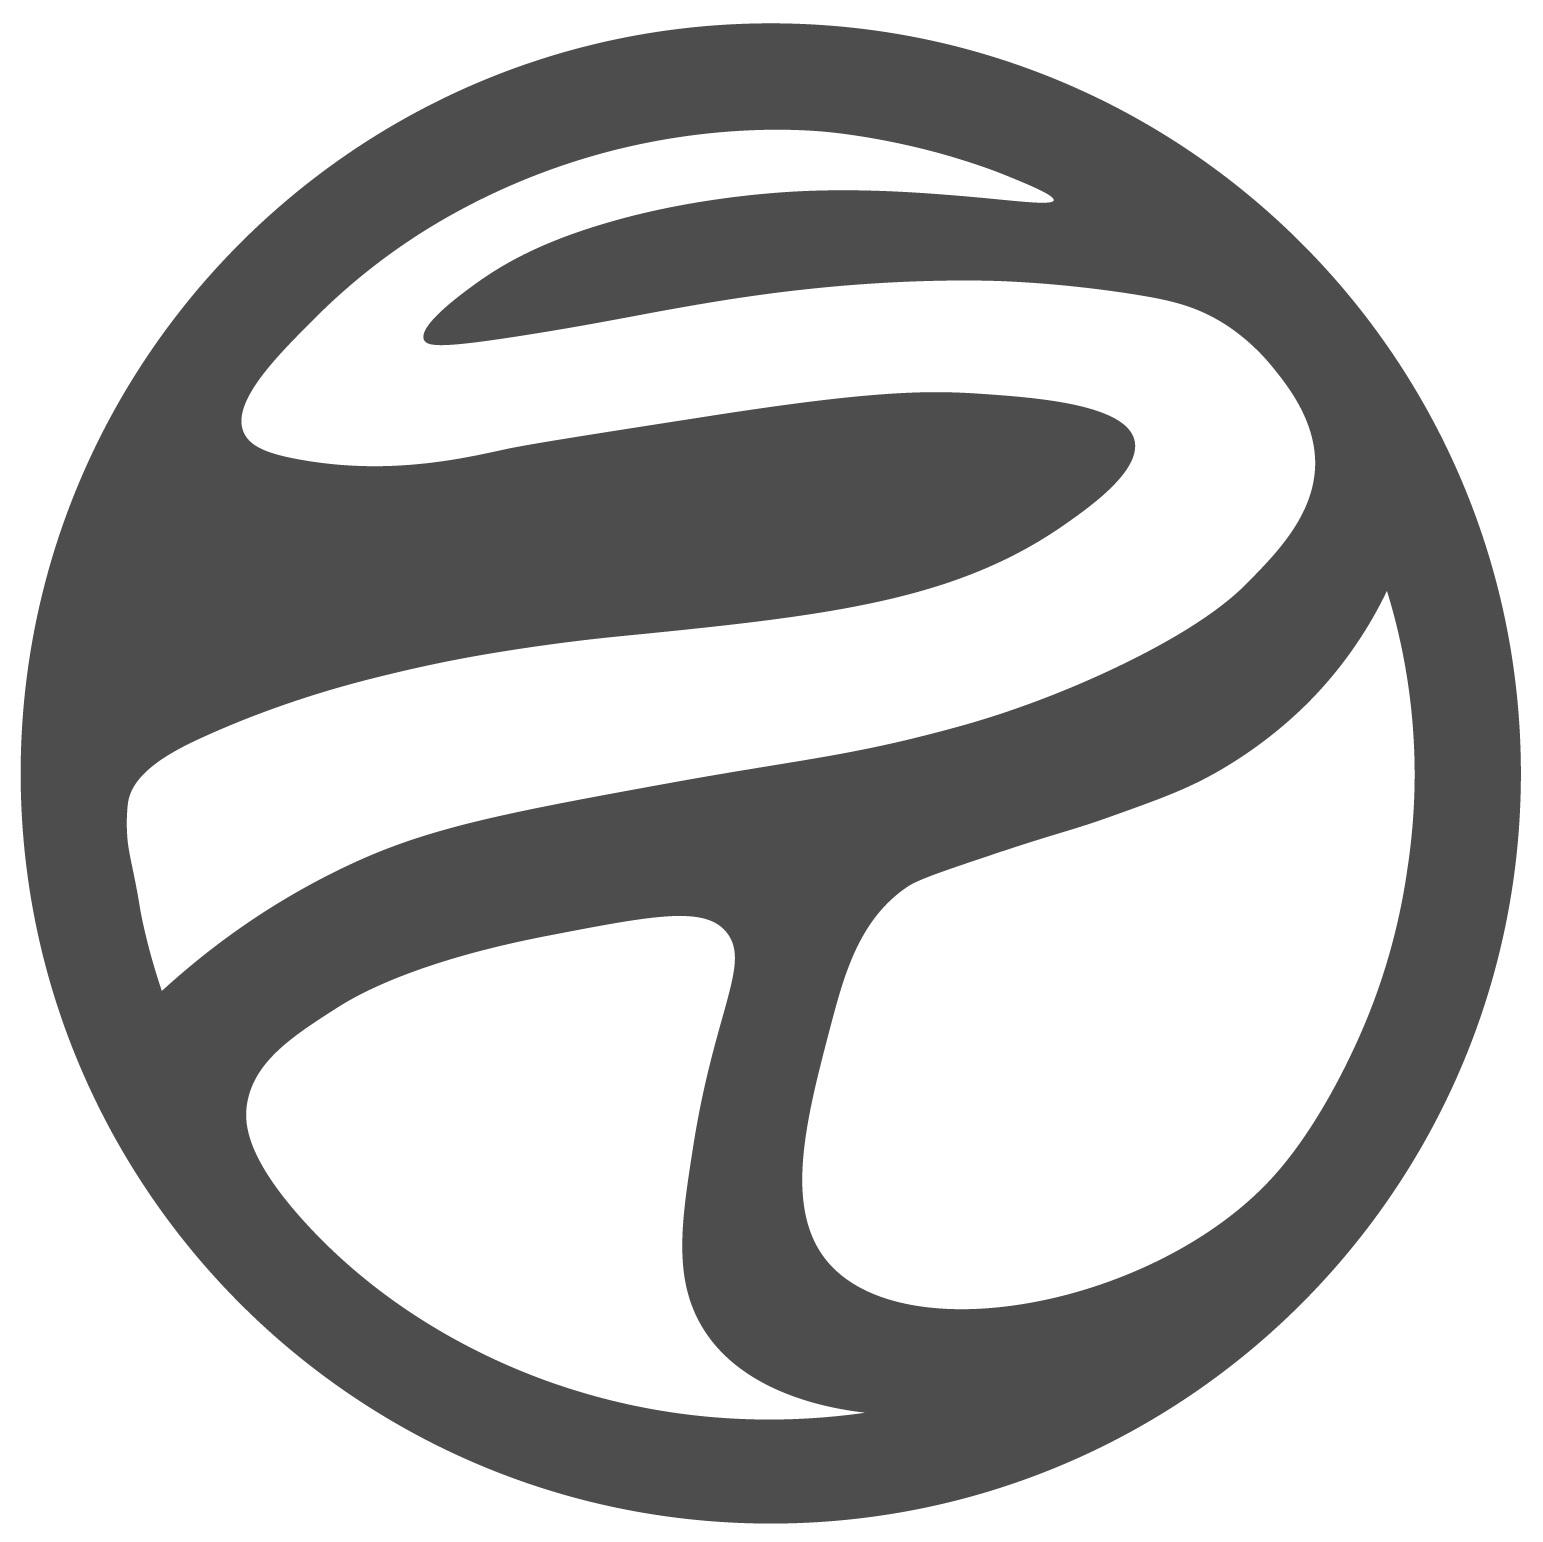 stsymbol.png